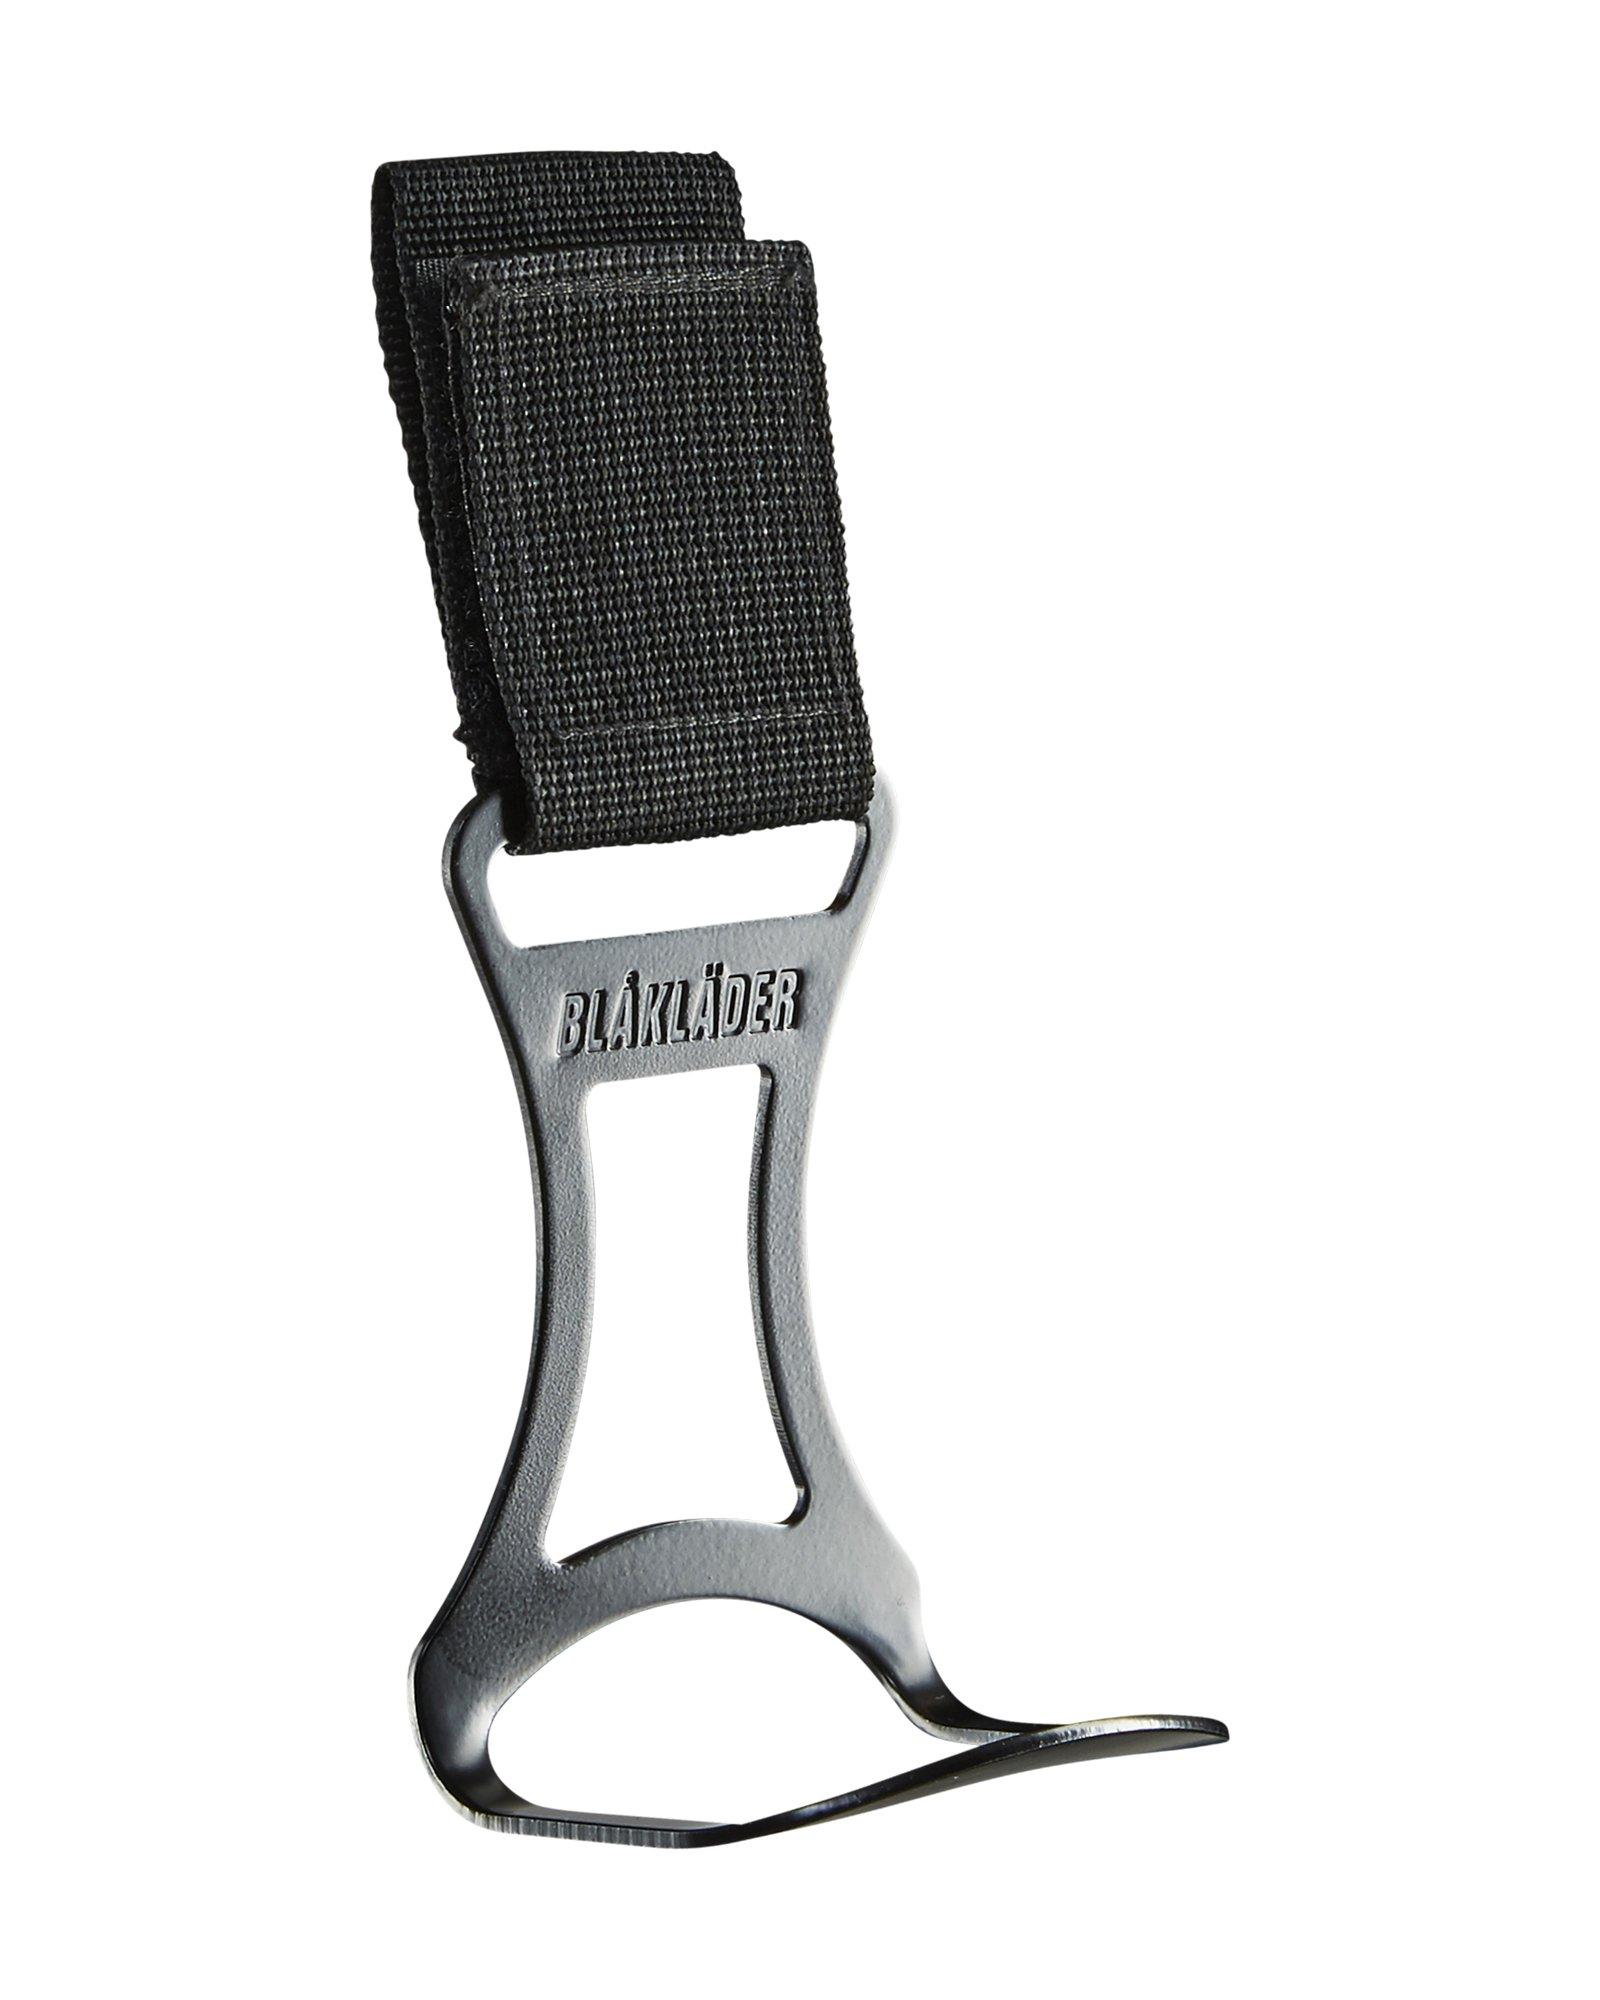 Blaklader Hammer Hook Black OS & Work Bandana Bundle